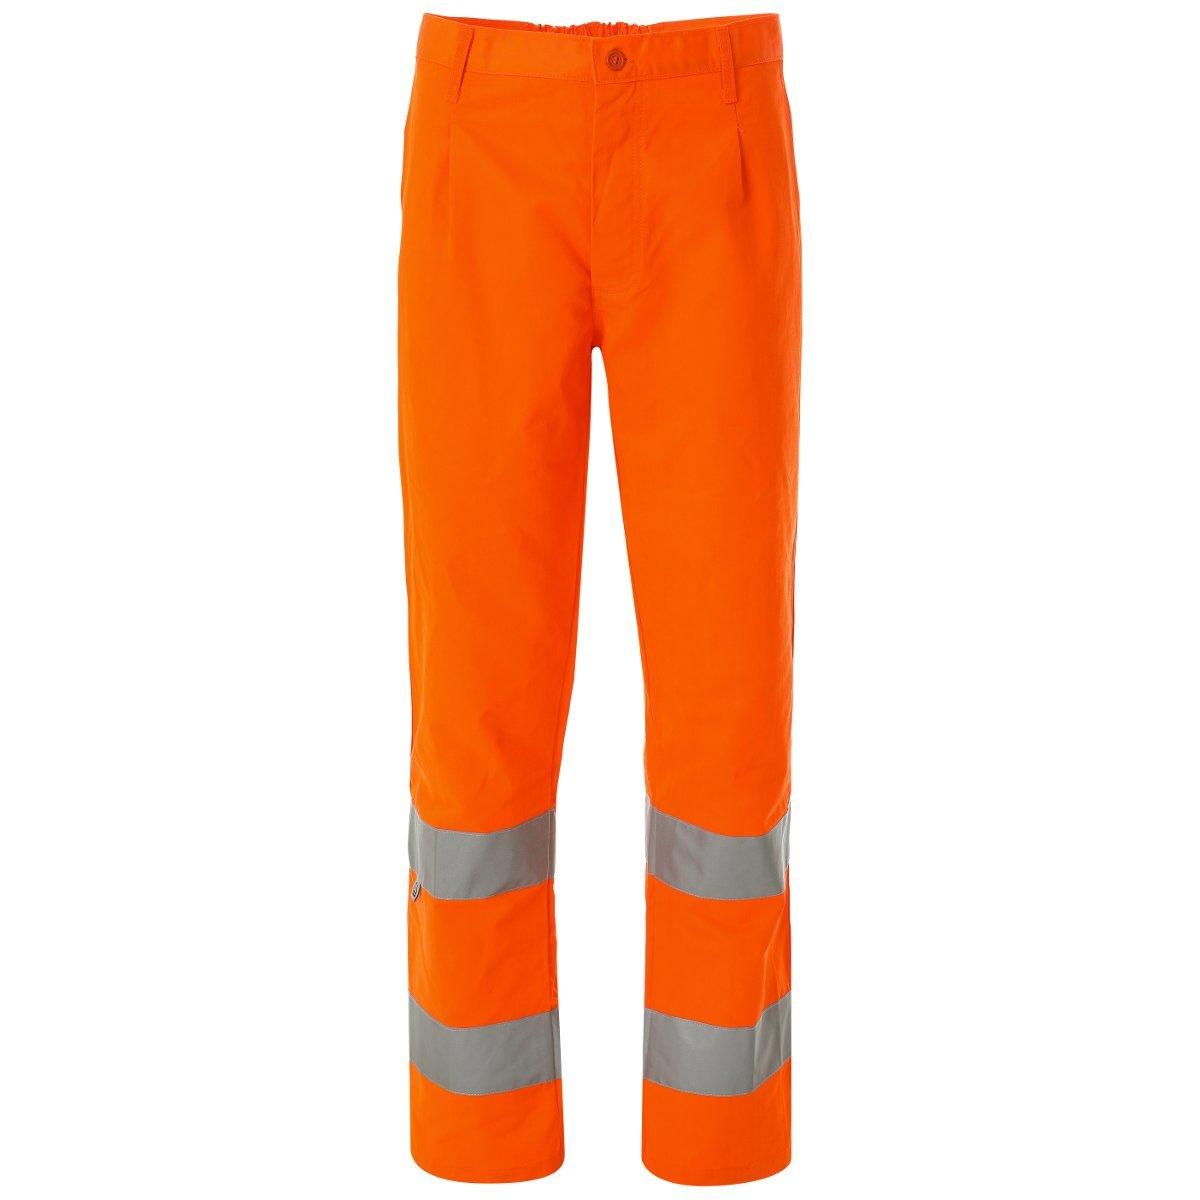 WORK AND STYLE Pantalones de Alta Visibilidad - Lumen